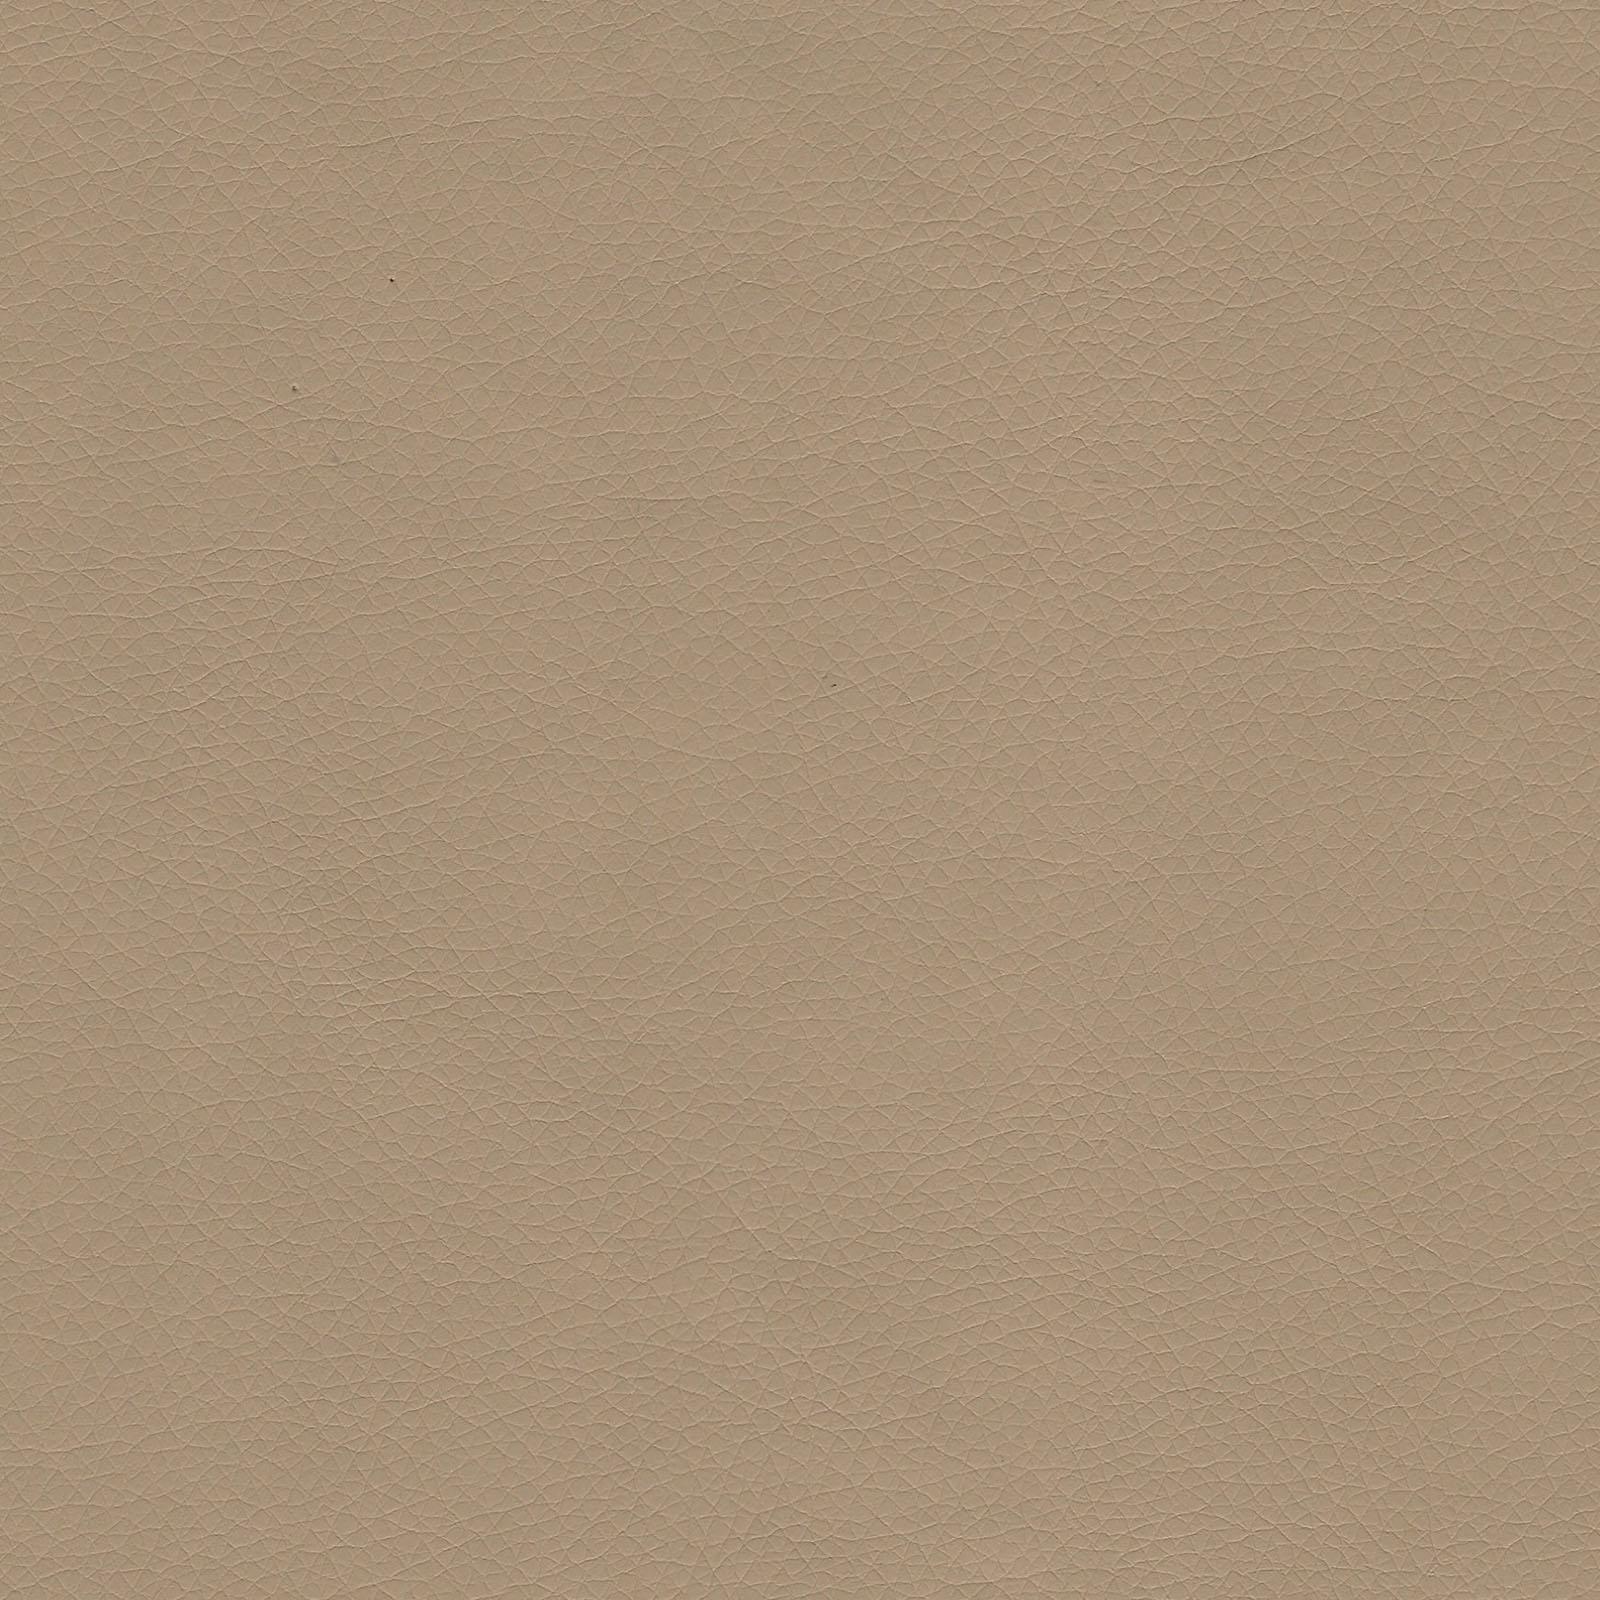 Caliber - CAL-8105 - Sandstone